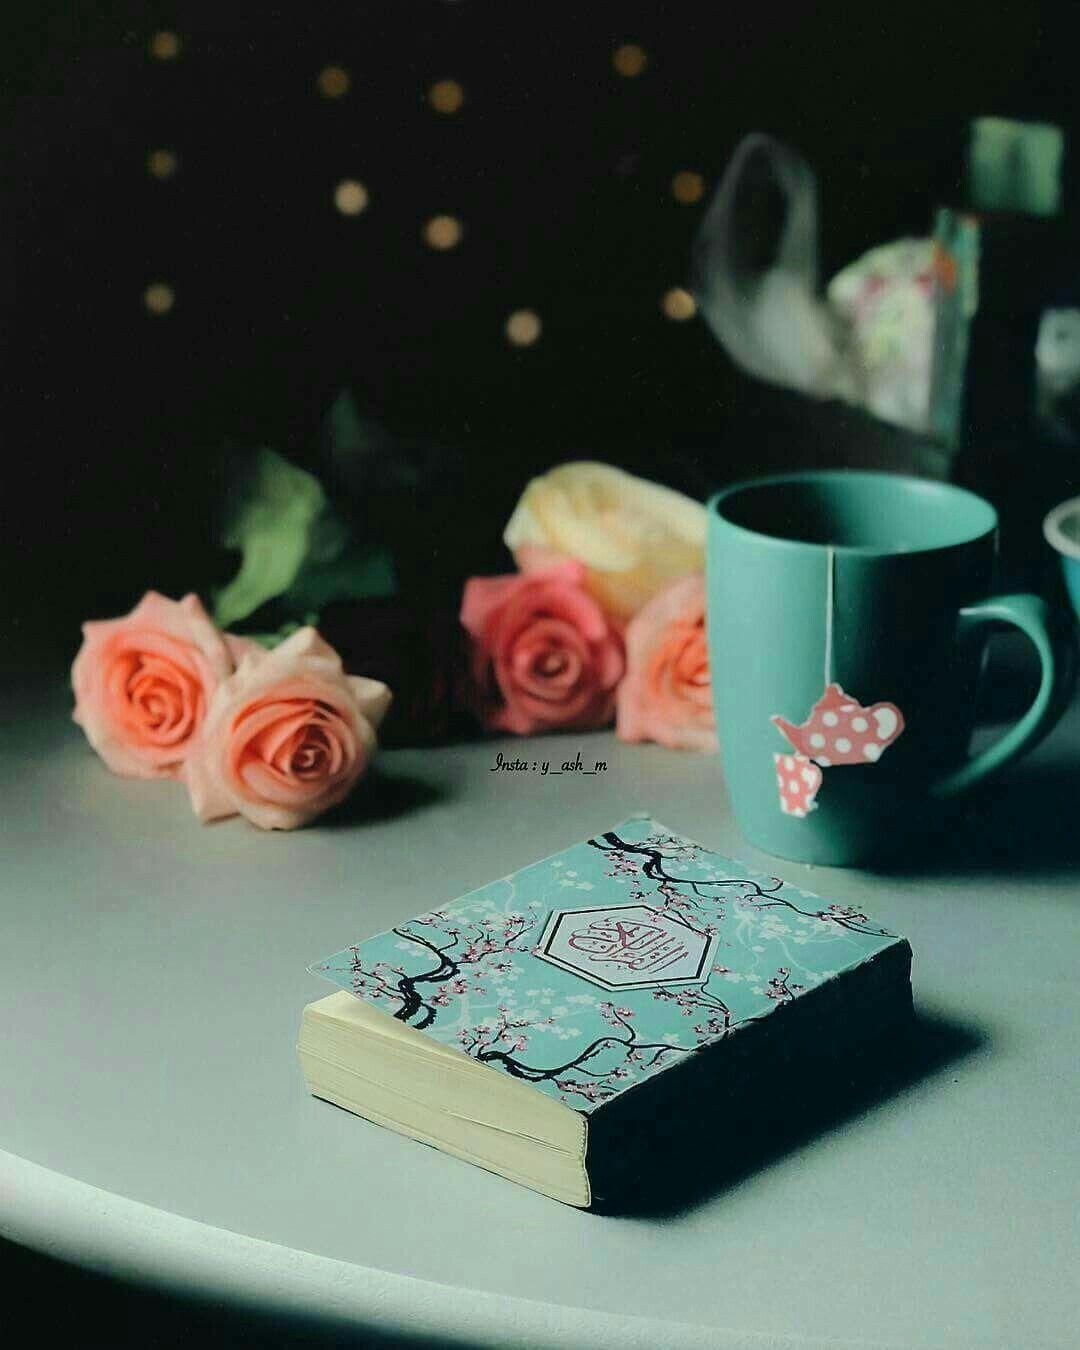 Pin By Arfah On Beautiful Mushaf Holy Quran Quran Wallpaper Quran Sharif